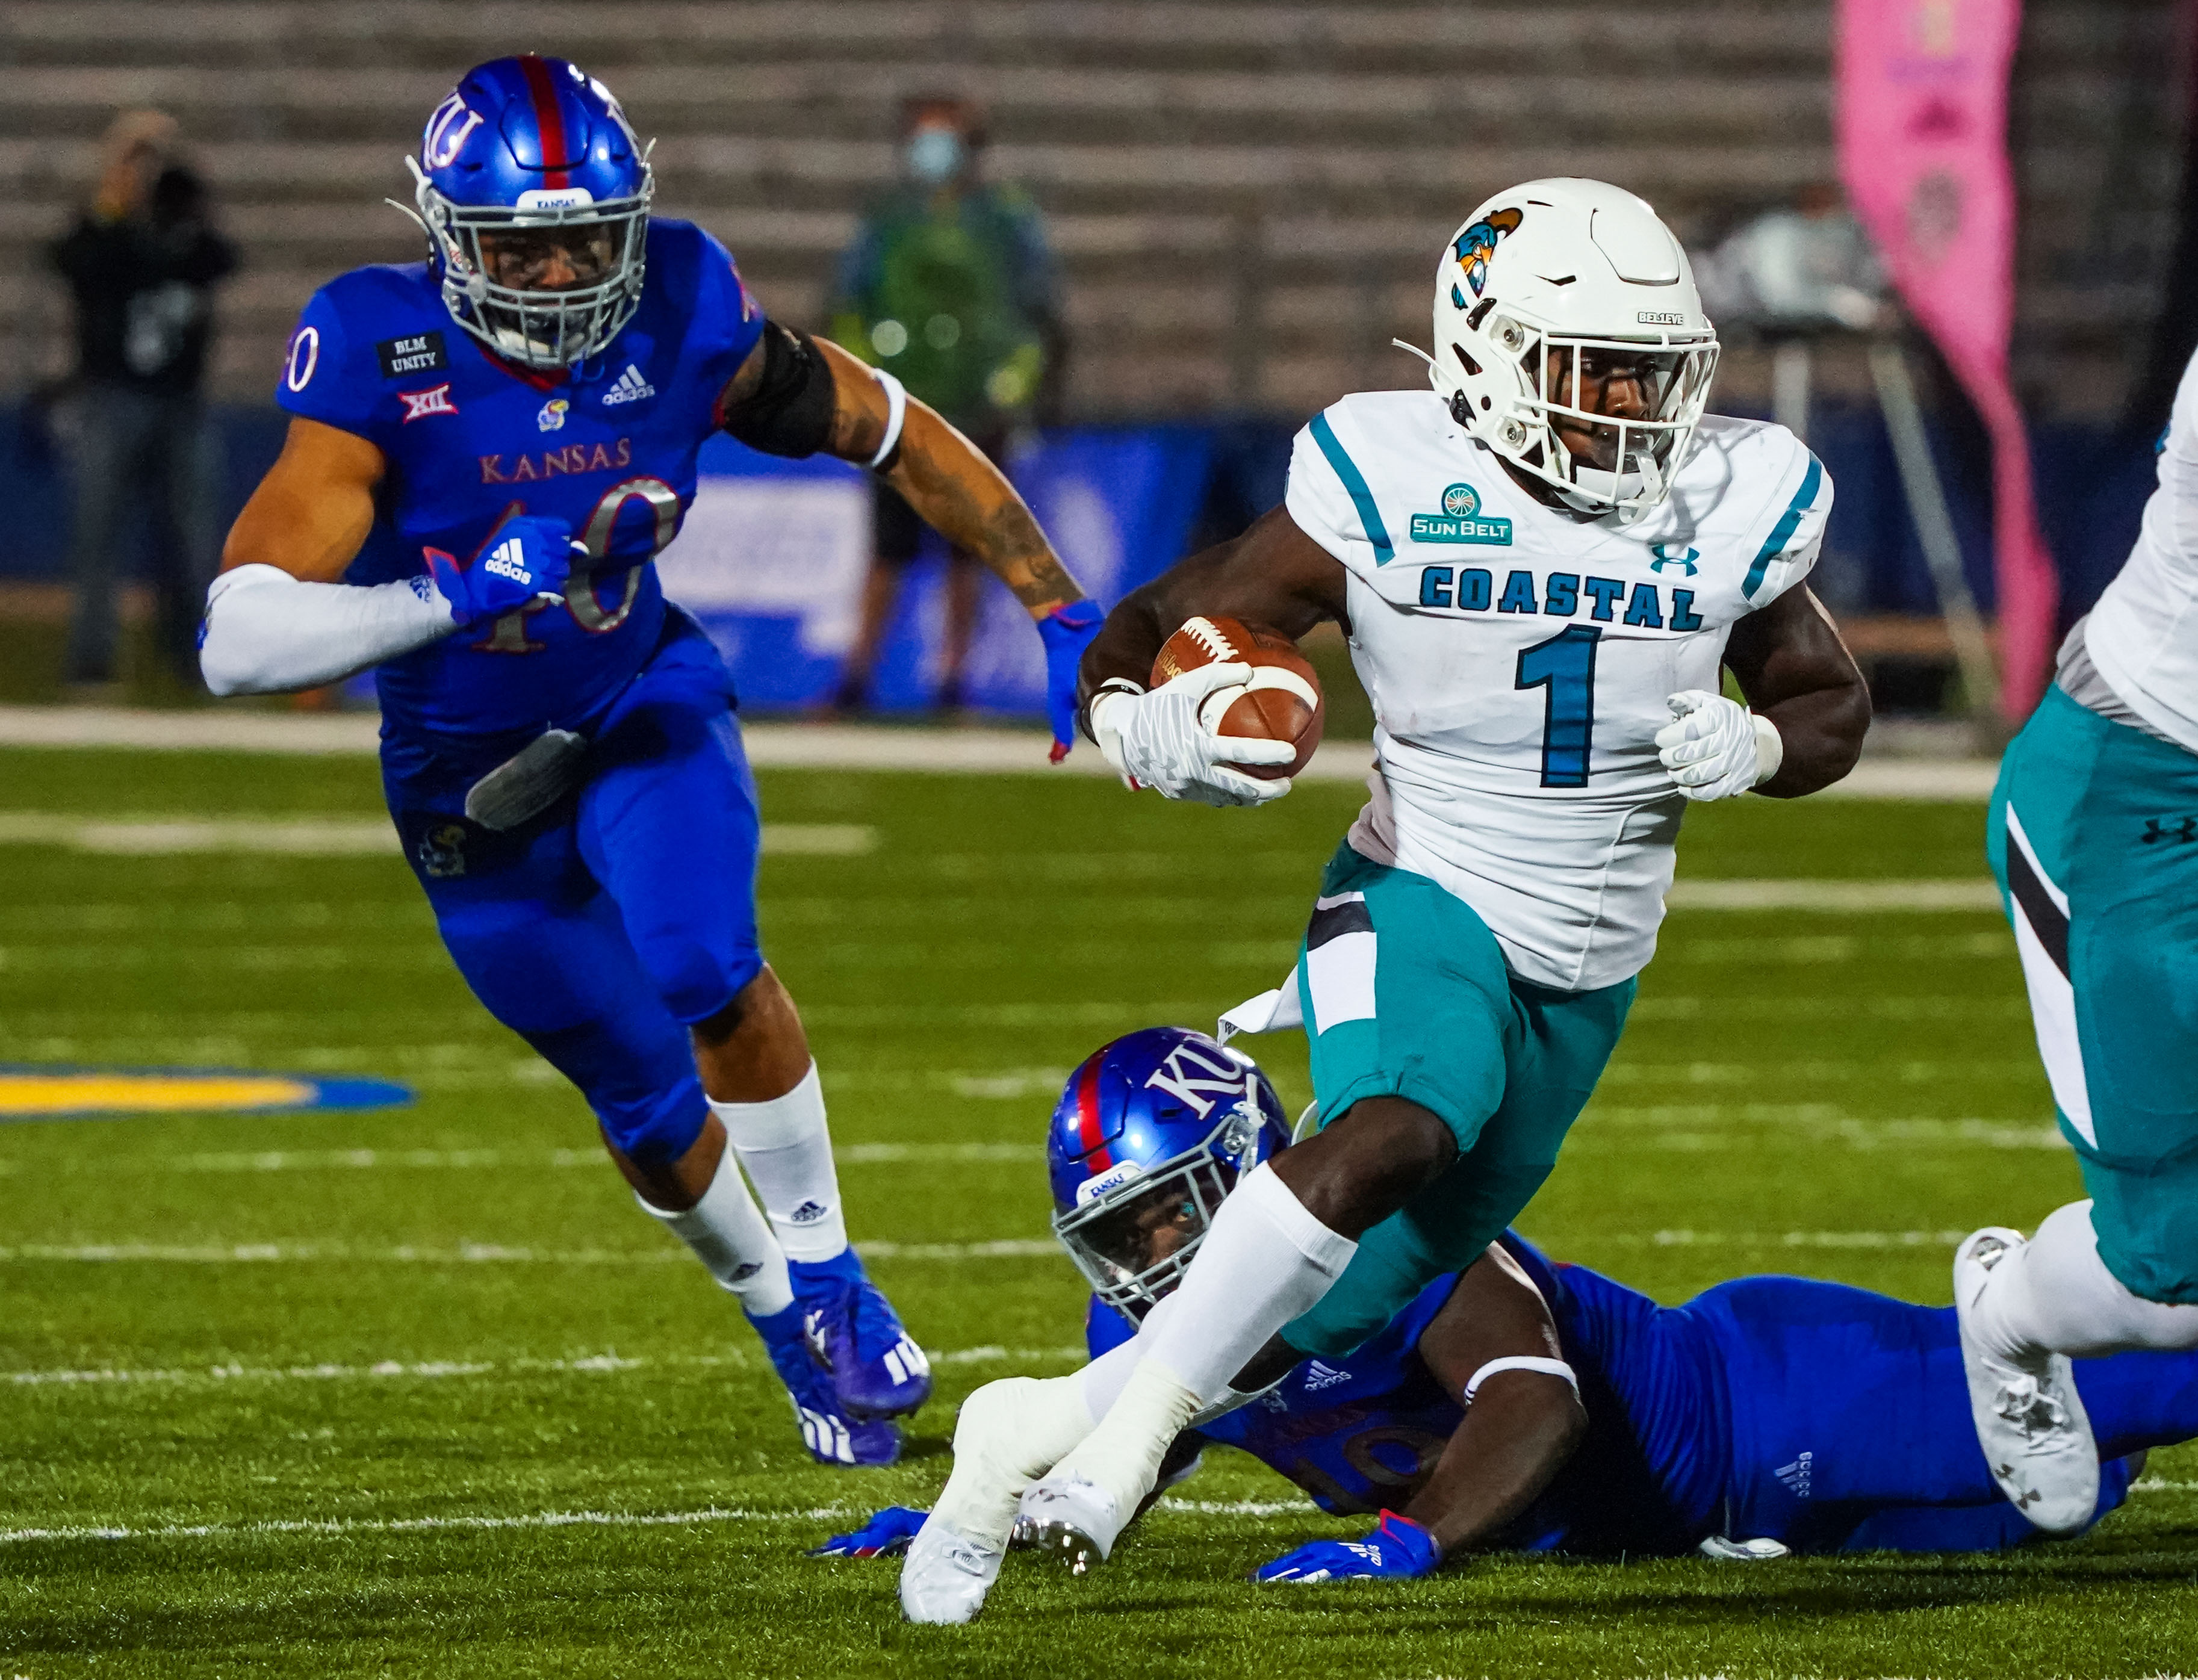 Coastal Carolina beats BYU to improve to 10-0 in 2020 NCAA College Football season